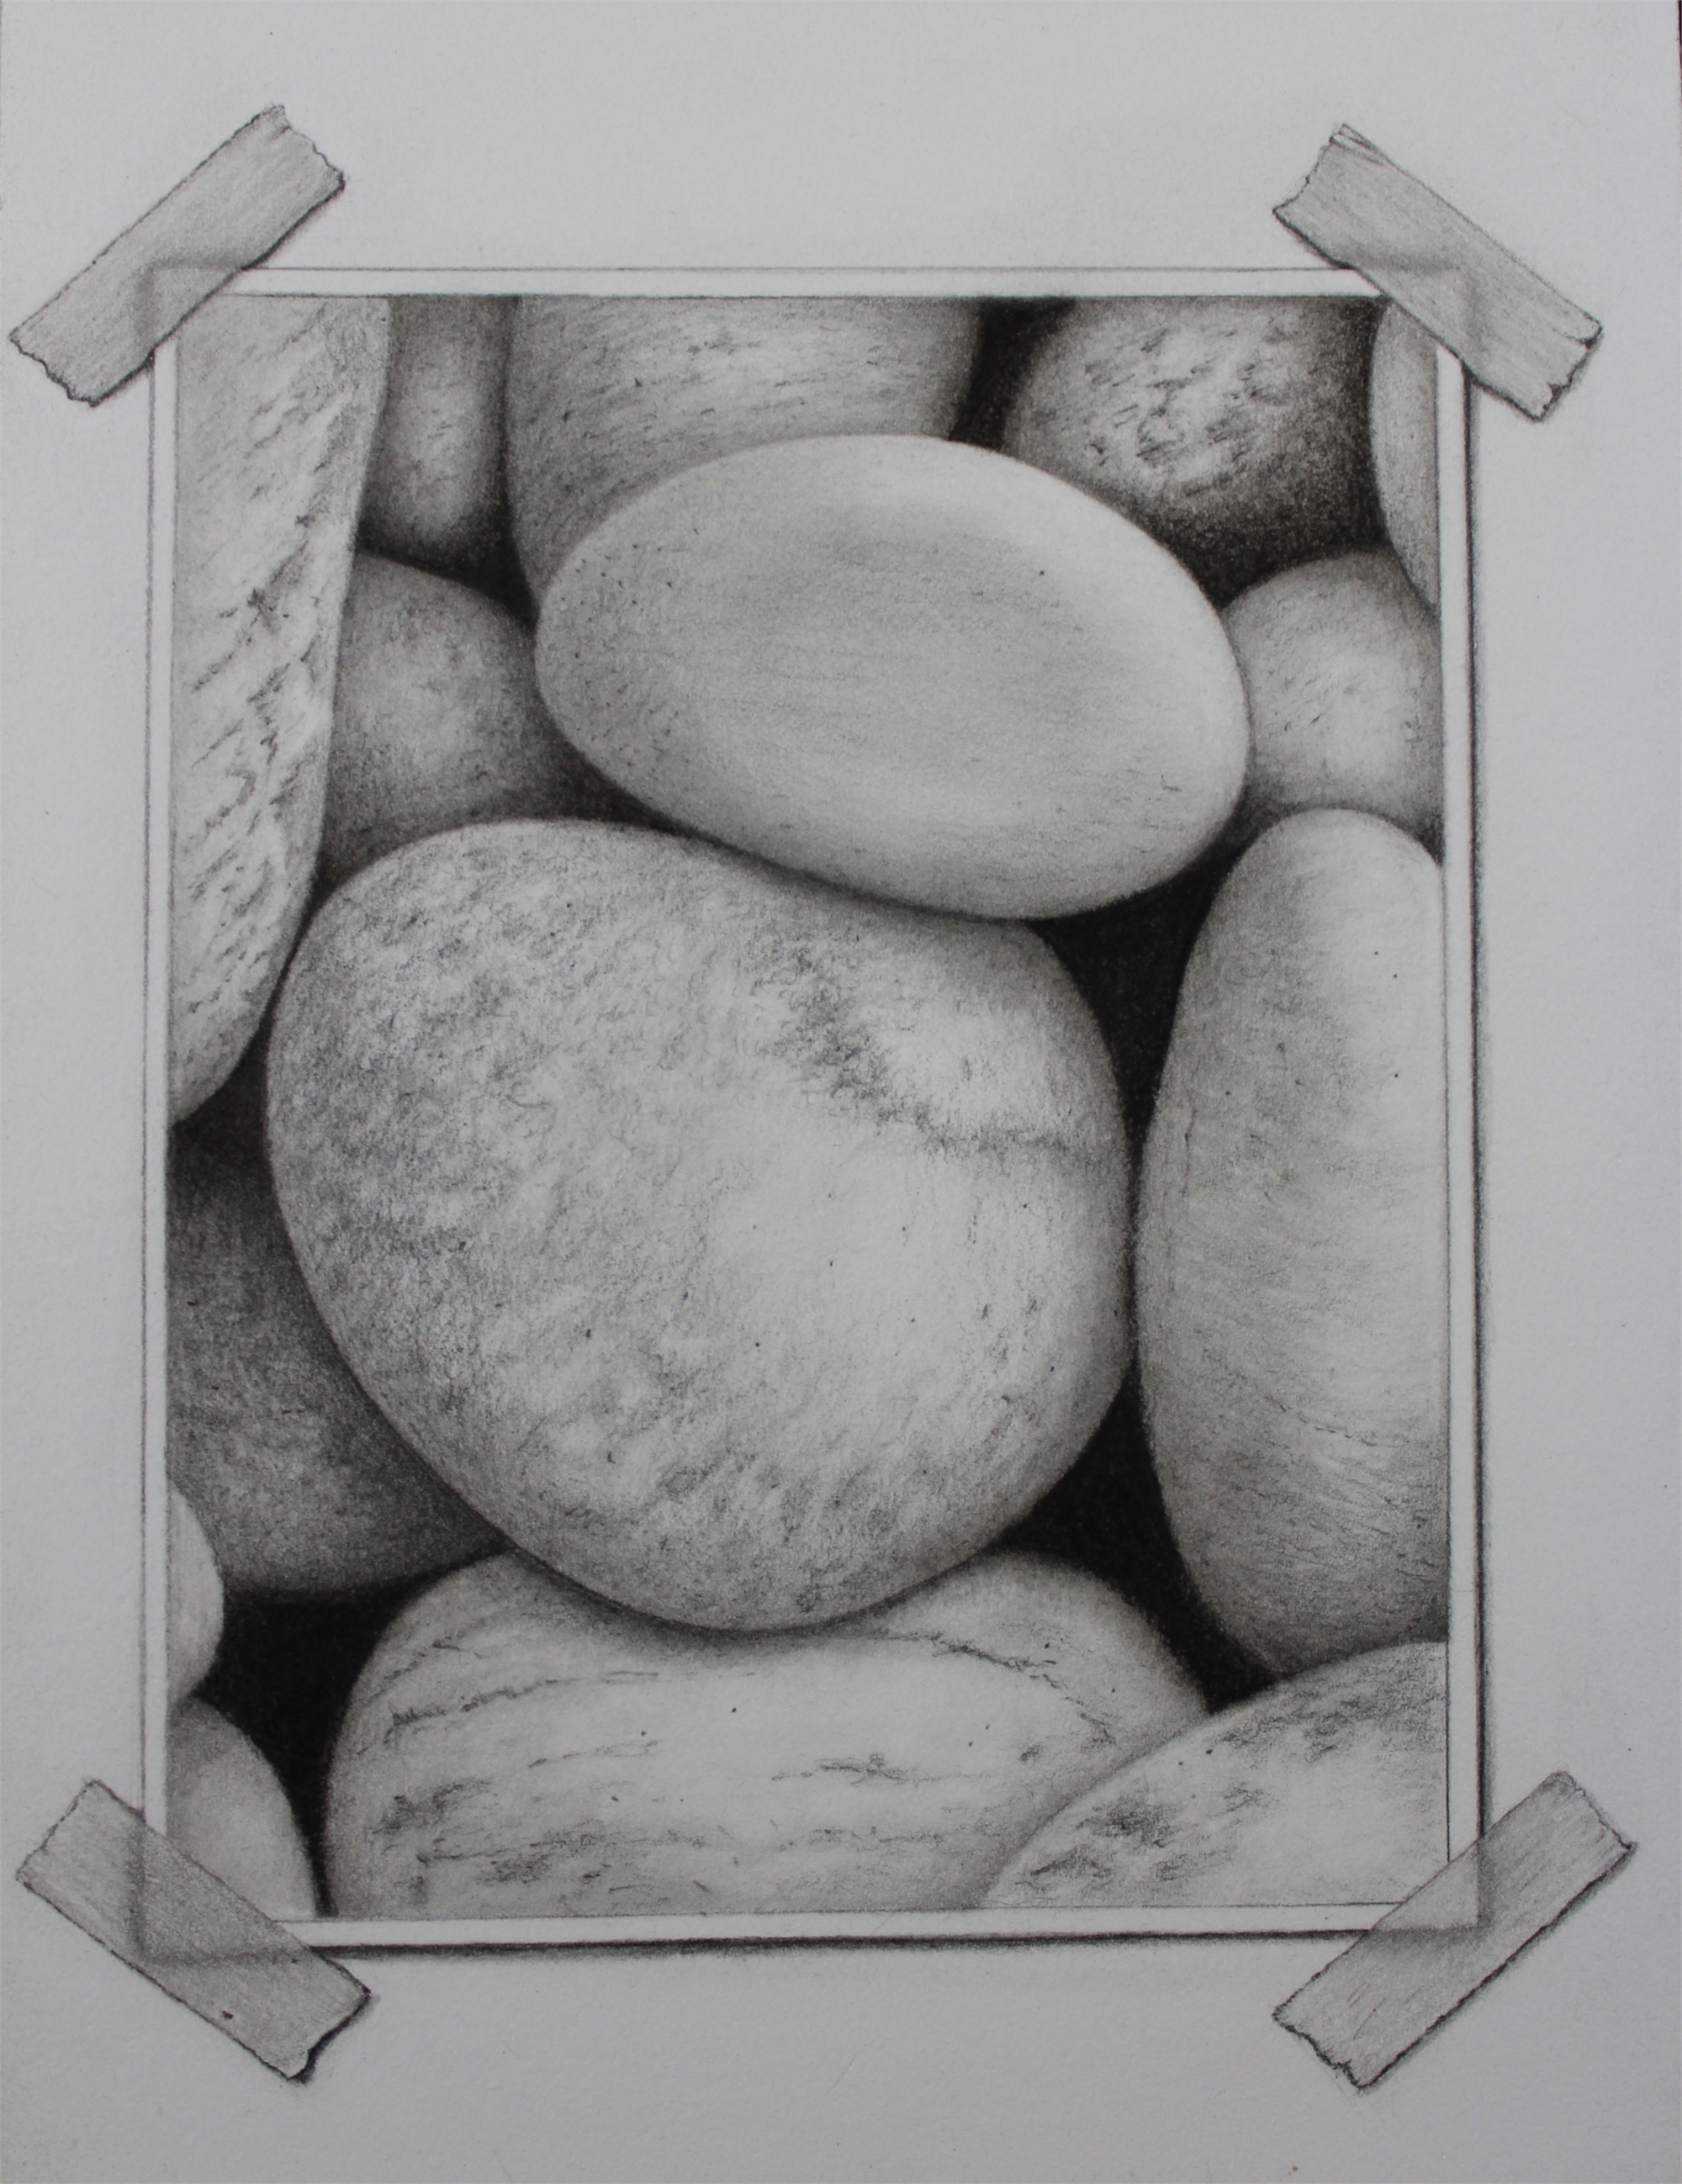 Snapshot Series: Rocks #2 by Tammy Liu-Haller